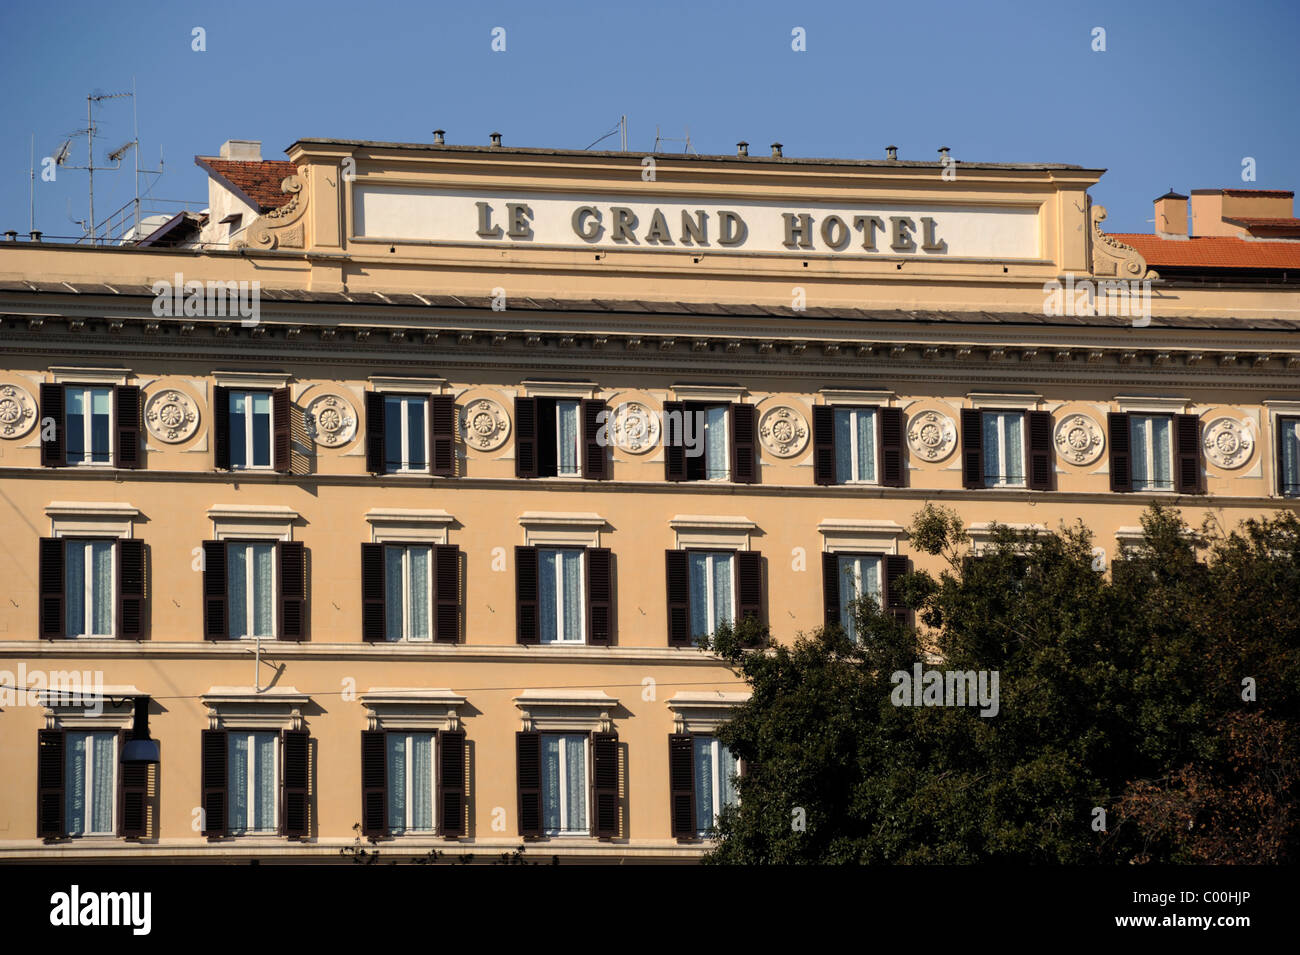 italy, rome, st regis grand hotel - Stock Image